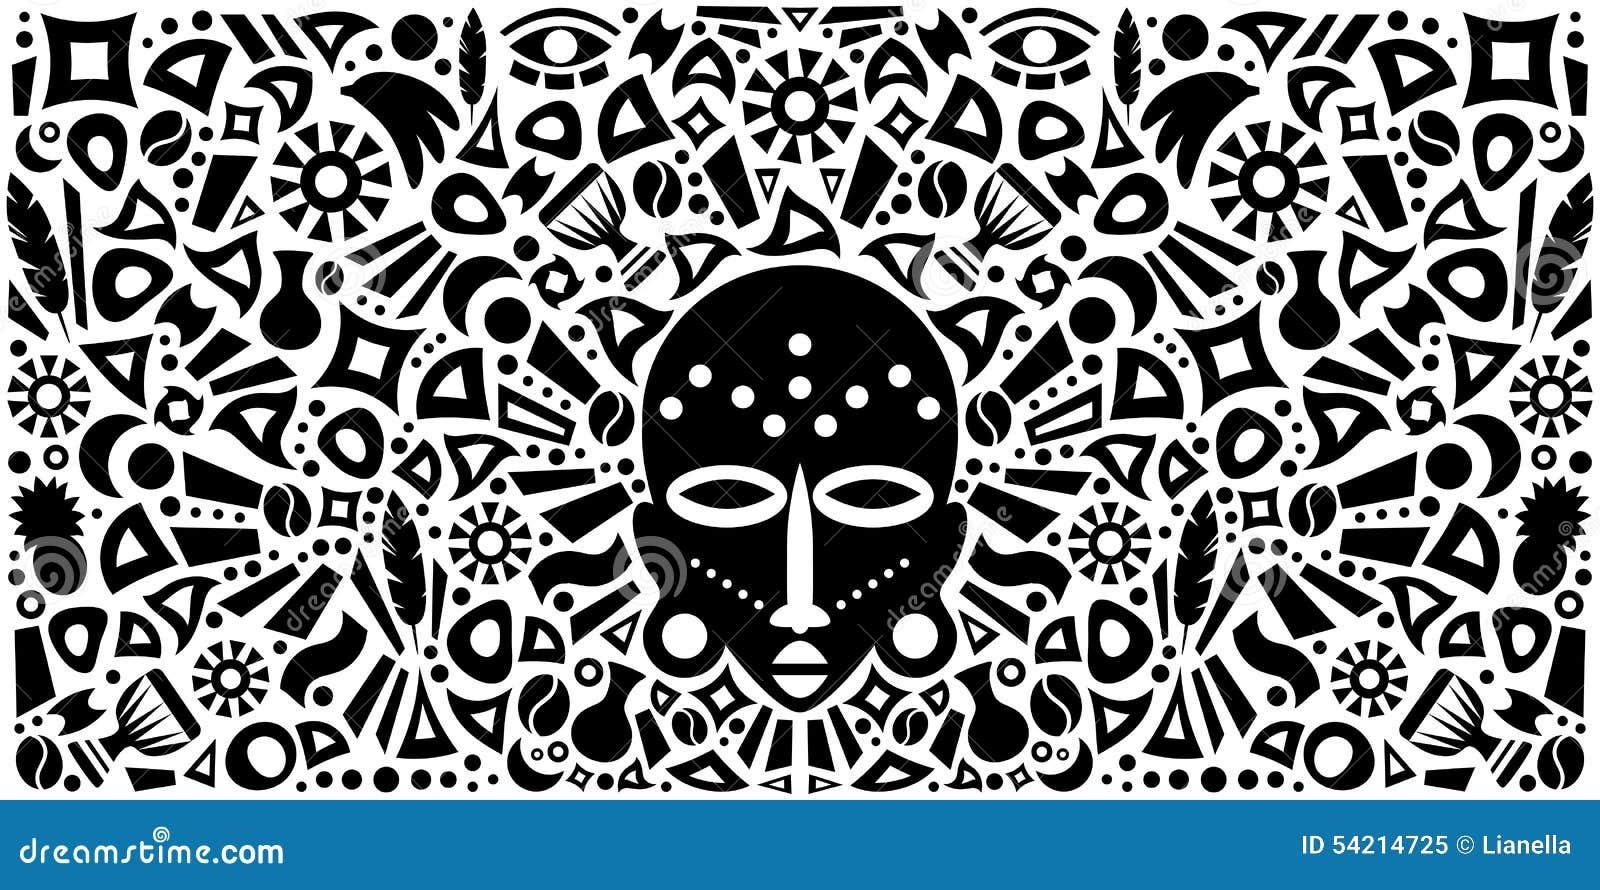 Tribal Mask Concept Art